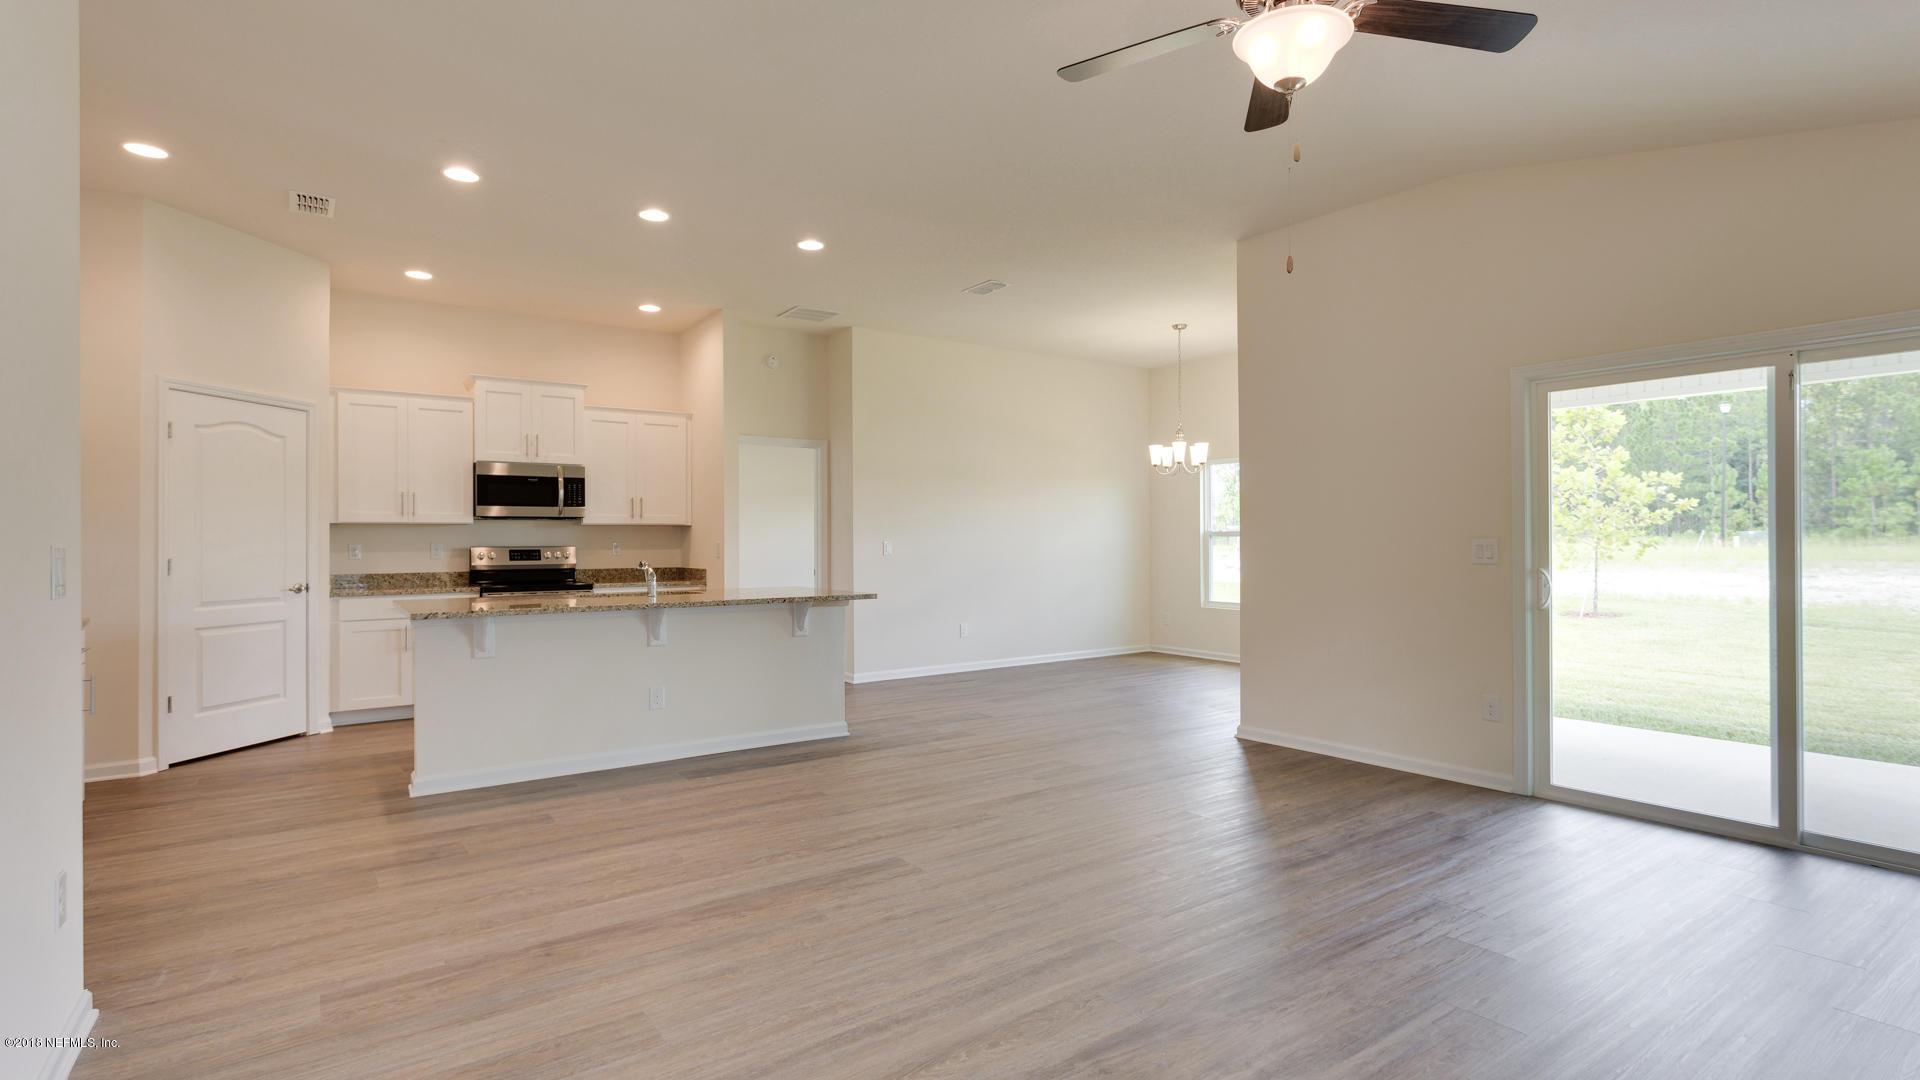 4094 SPRING CREEK, MIDDLEBURG, FLORIDA 32068, 3 Bedrooms Bedrooms, ,2 BathroomsBathrooms,Residential - single family,For sale,SPRING CREEK,945173